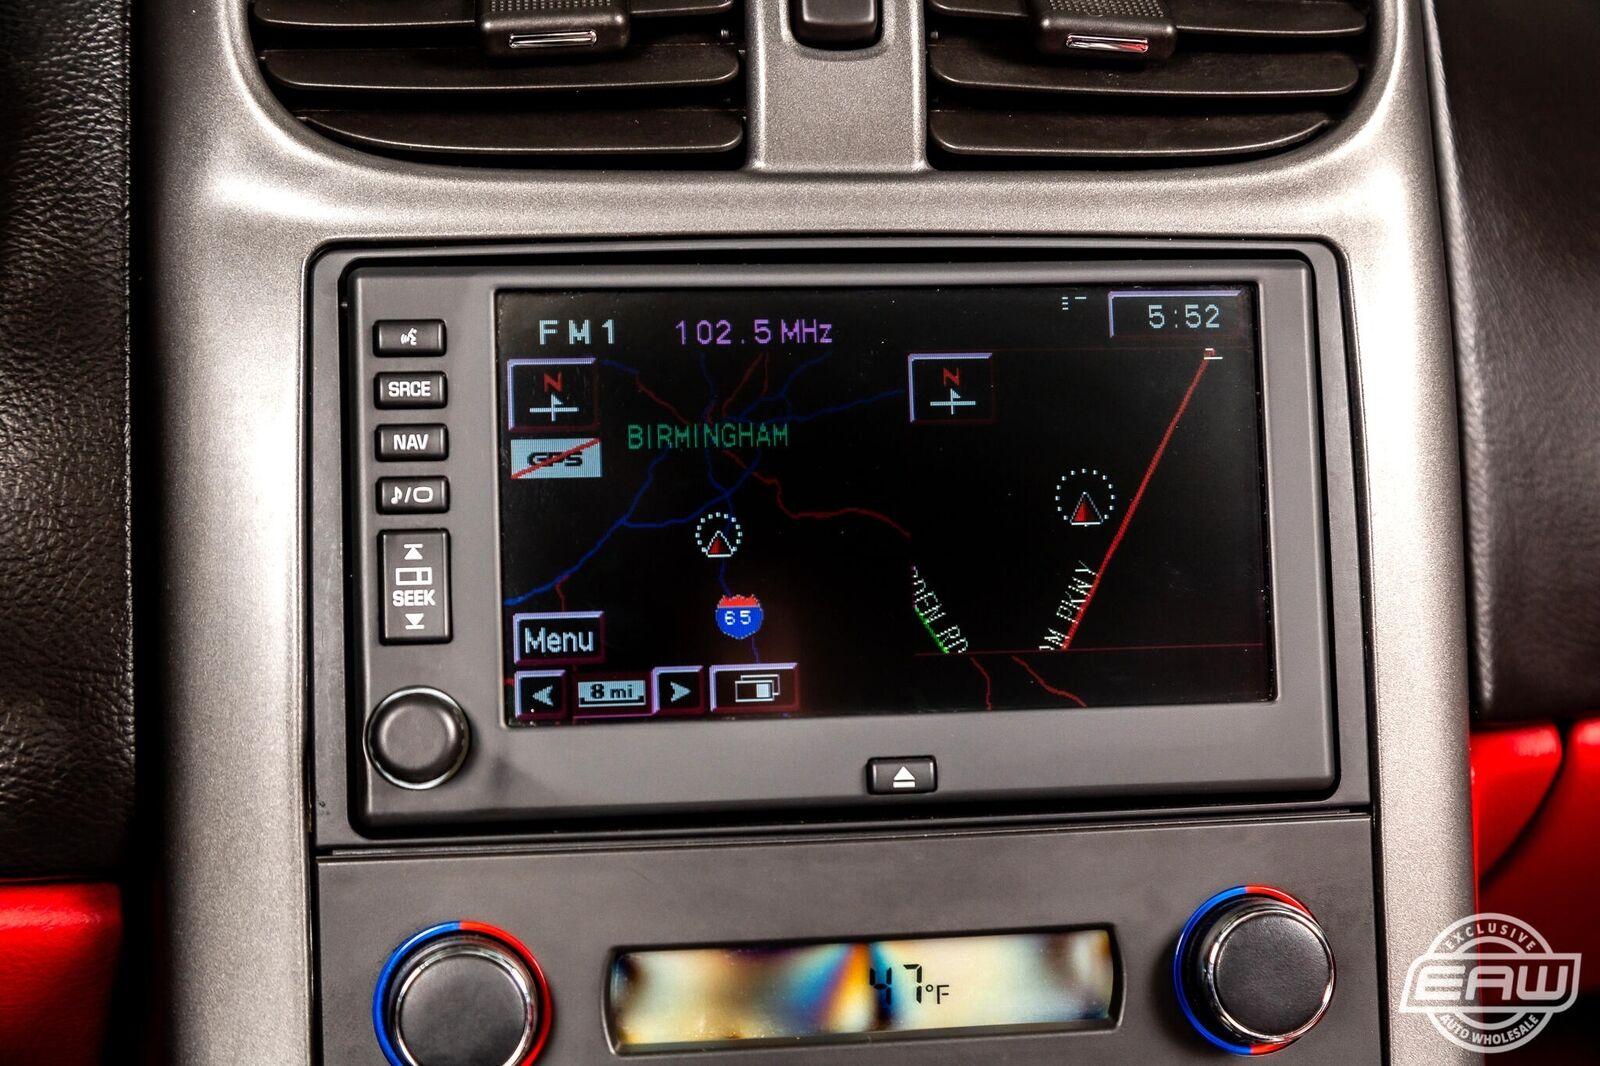 2006 White Chevrolet Corvette Convertible  | C6 Corvette Photo 8